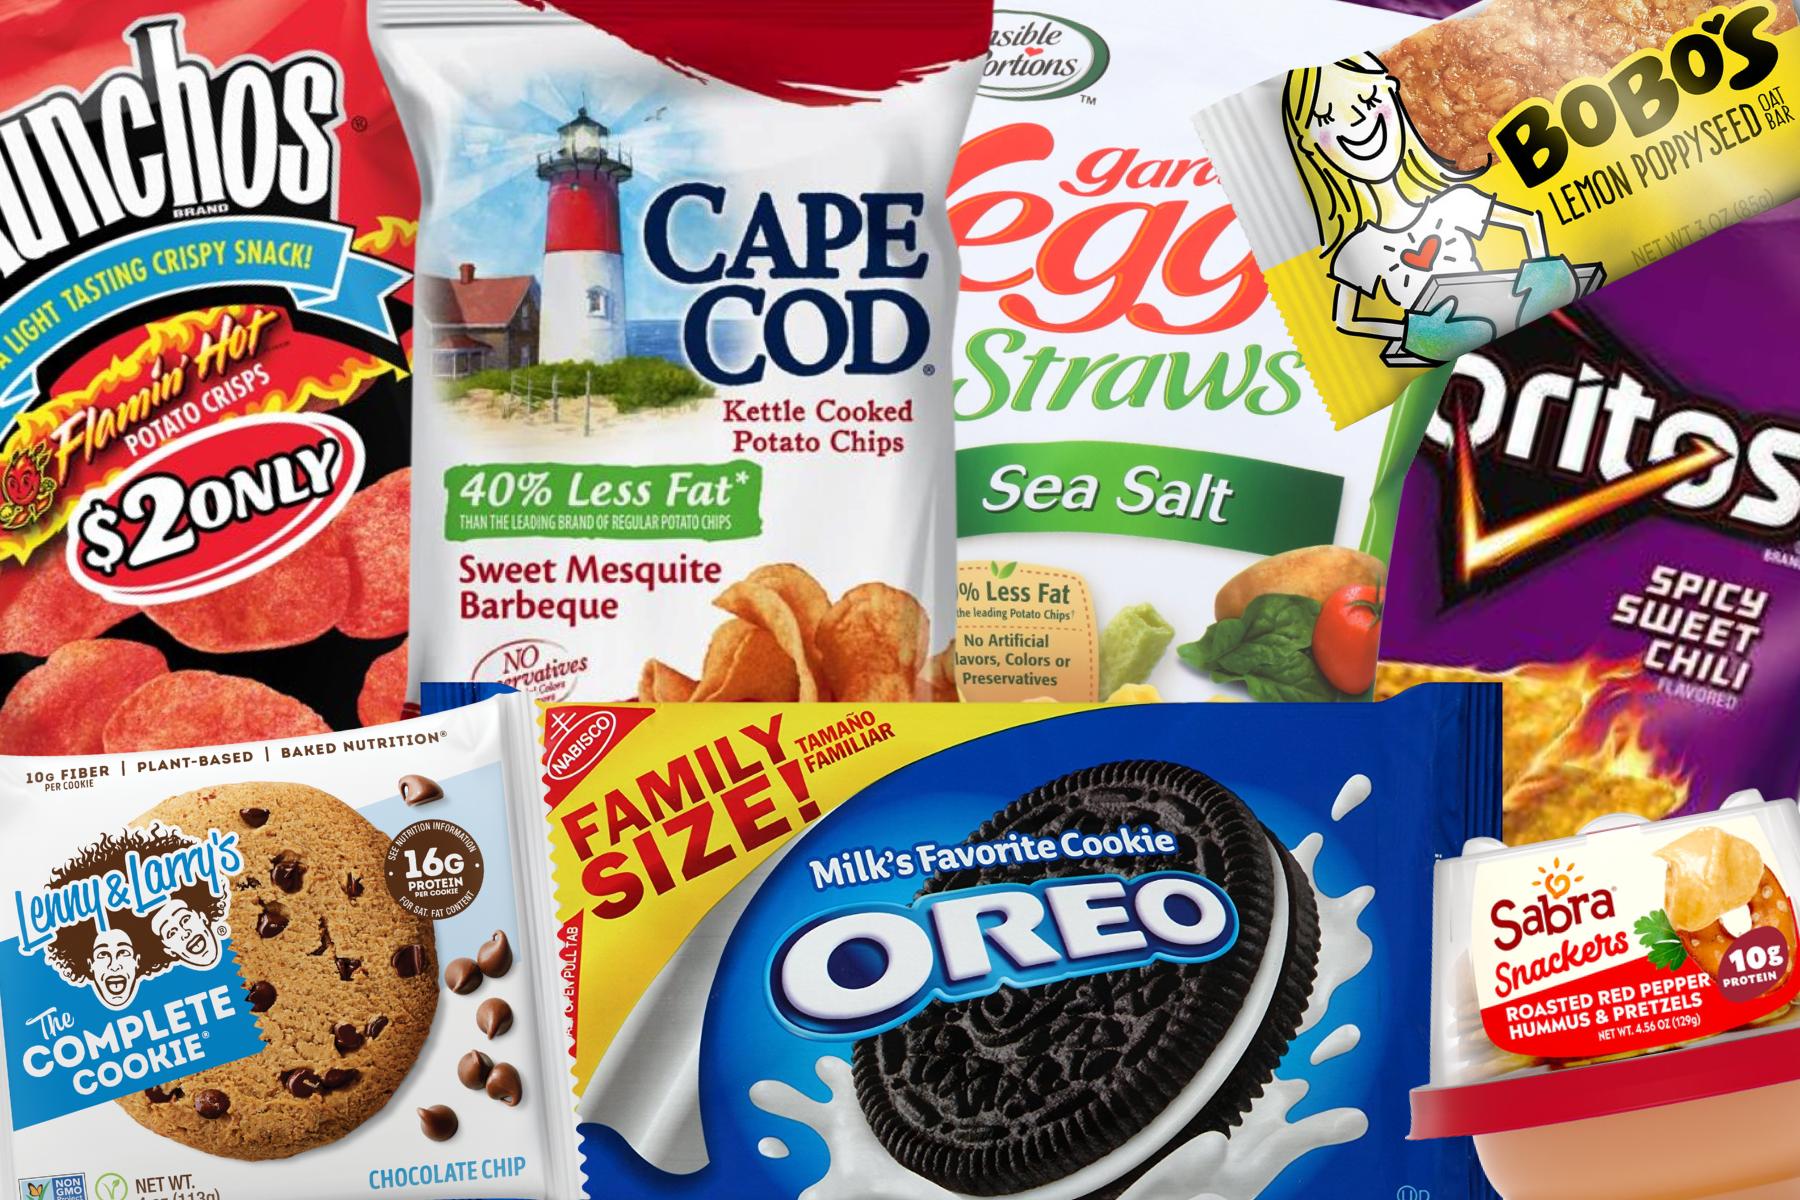 Vegan gas station tips image shows vegan snacks including Bobo's oat bar, Munchos Flamin' Hot Potato Crisps, and Cape Cod Sweet Mesquite Barbeque Chips